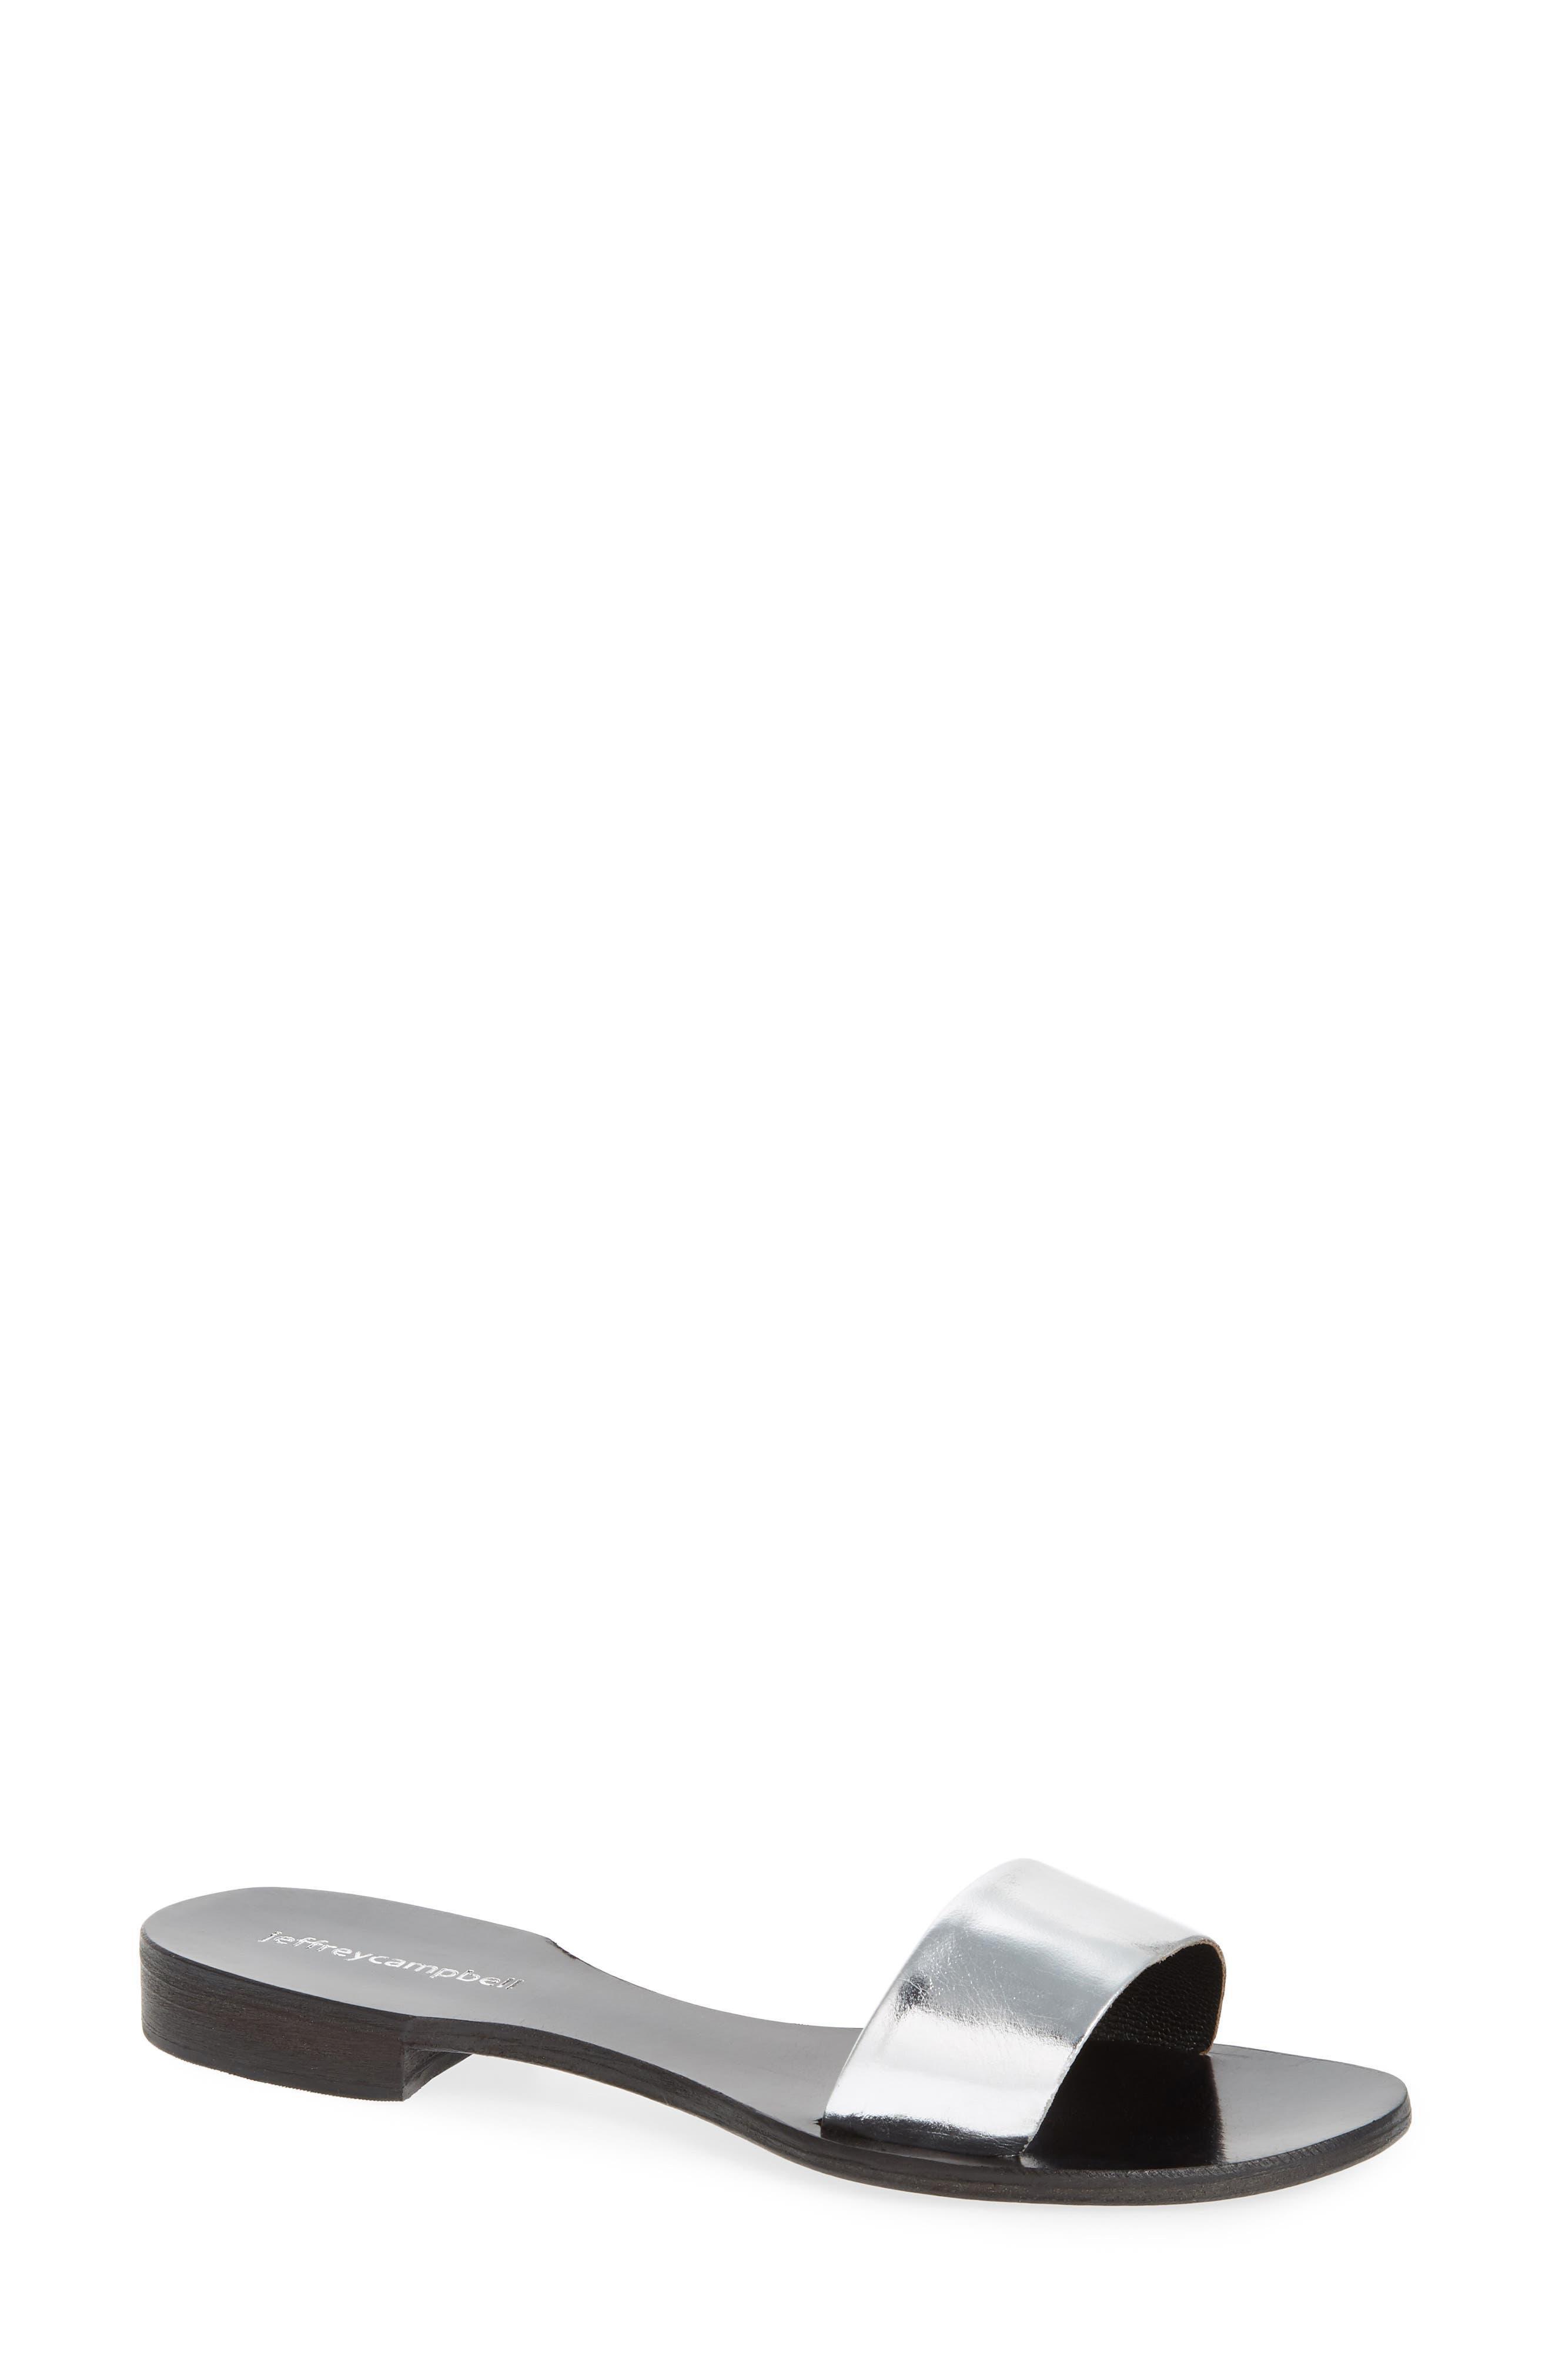 Monzon Slide Sandal,                             Main thumbnail 1, color,                             044